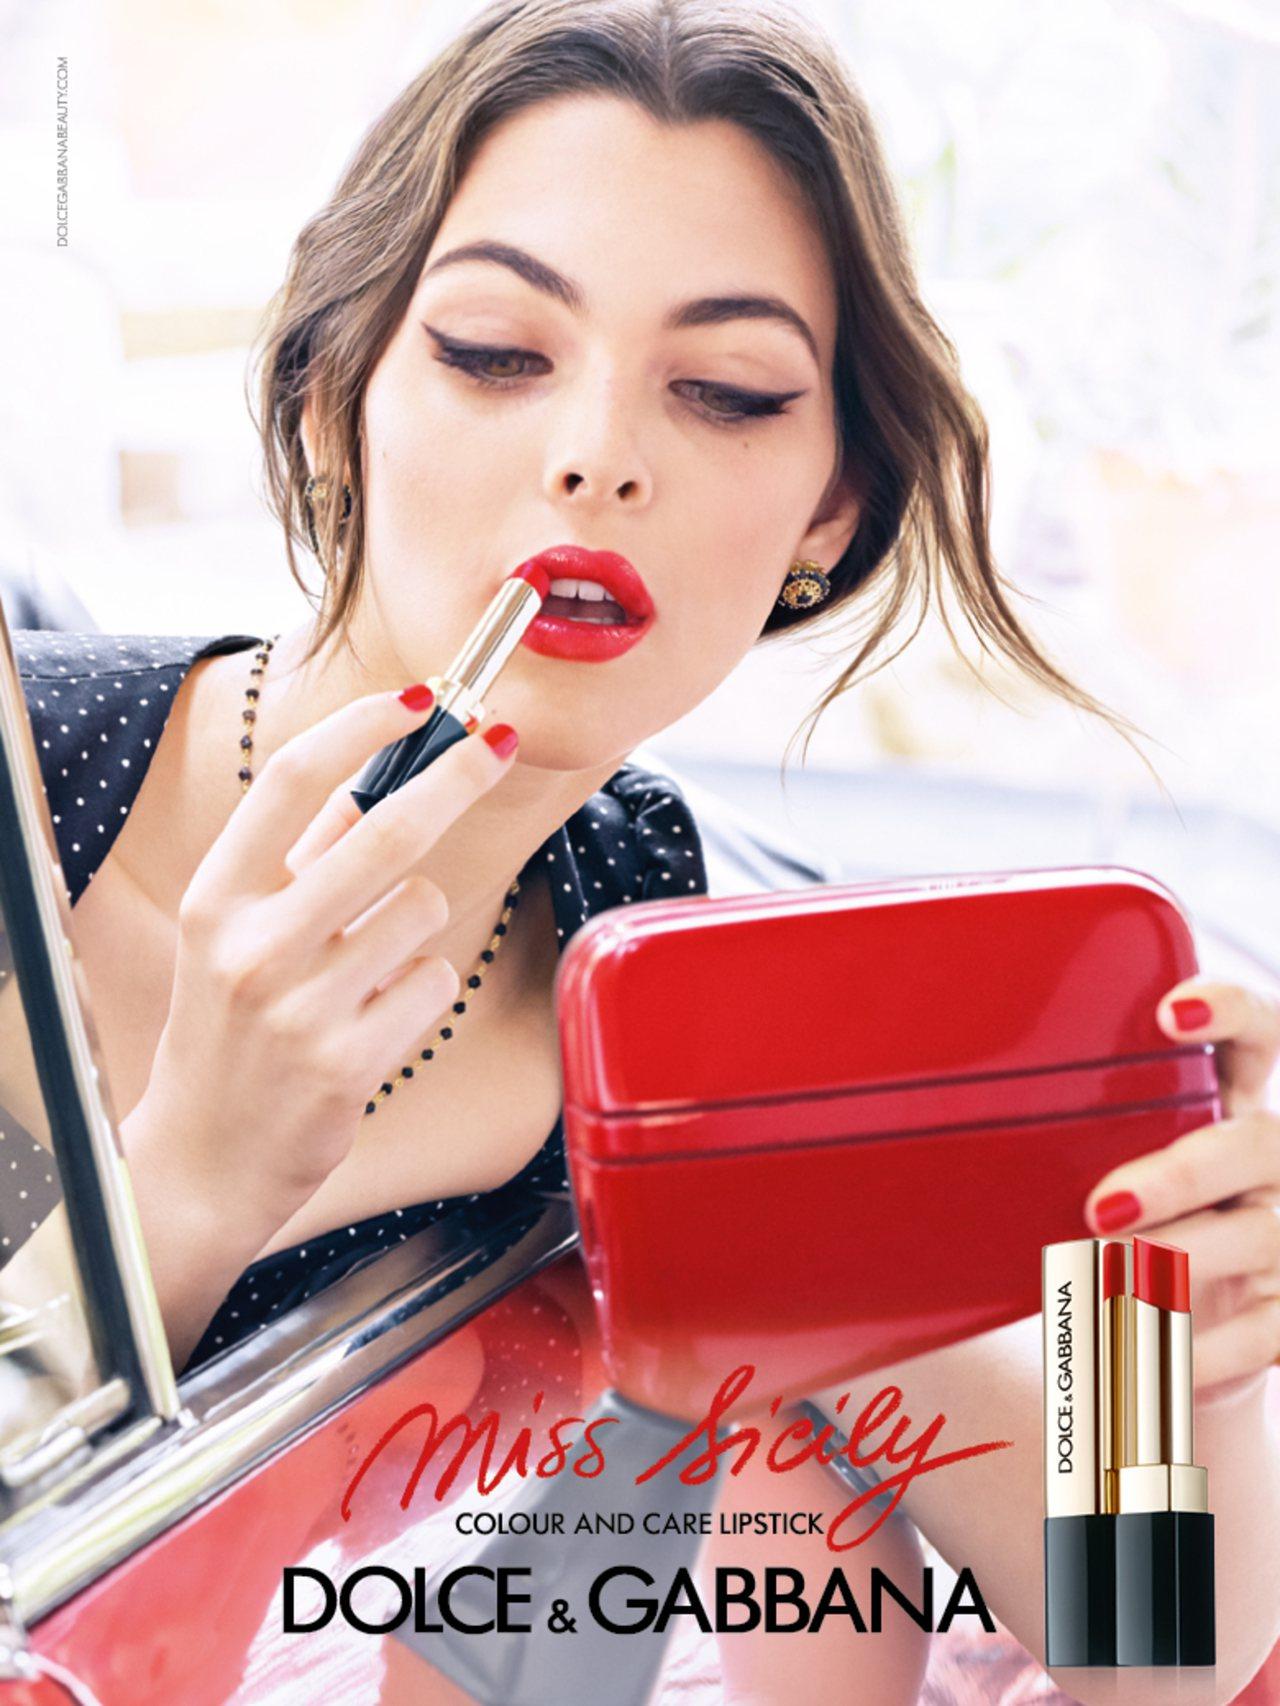 Miss Sicily唇膏主視覺。圖/Dolce & Gabbana提供